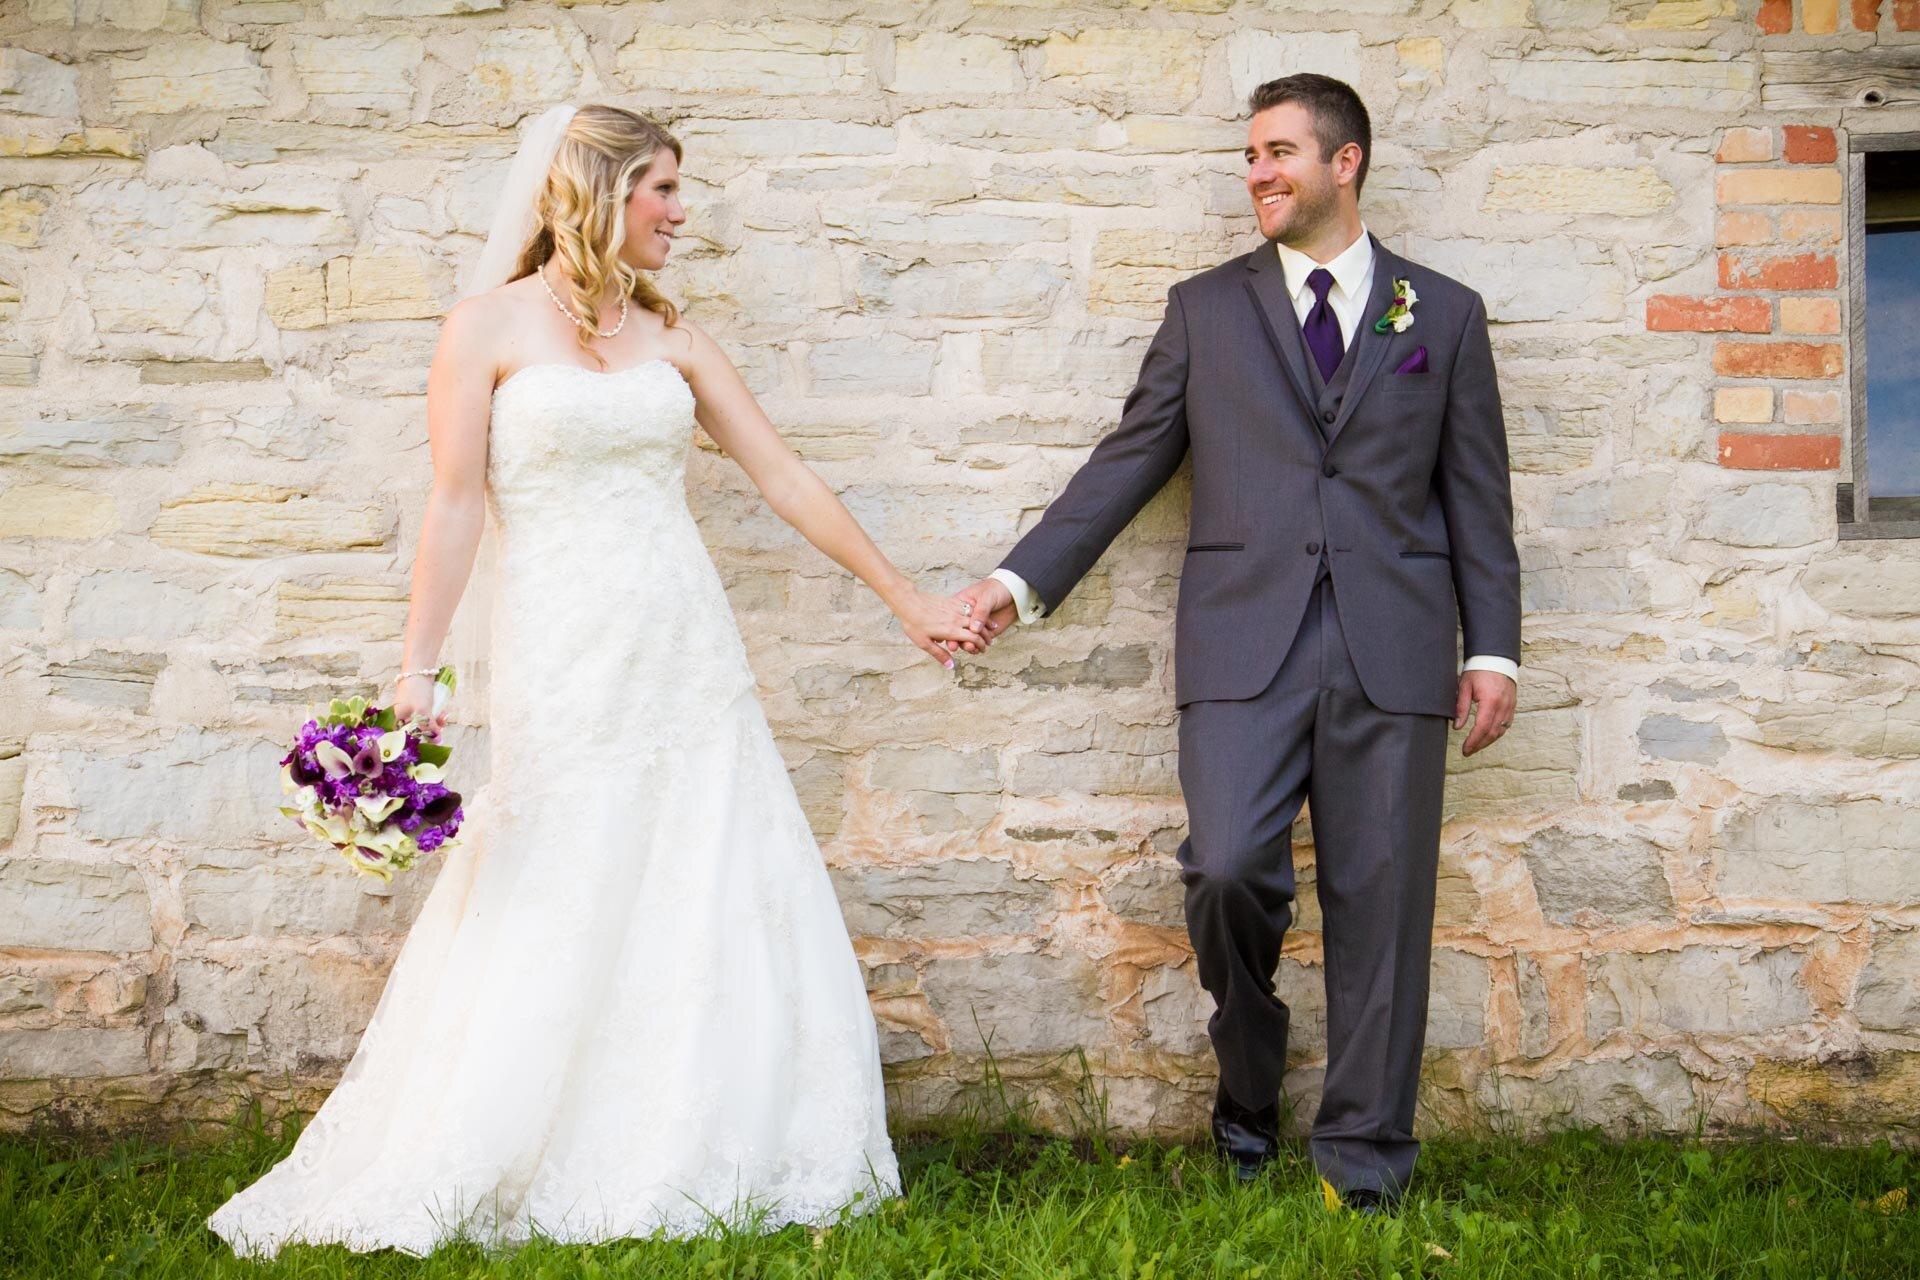 fall-lighting-adam-shea-photography-wedding-engagement-blog-adam-shea-photography-green-bay-appleton-neenah-photographer-02.jpg